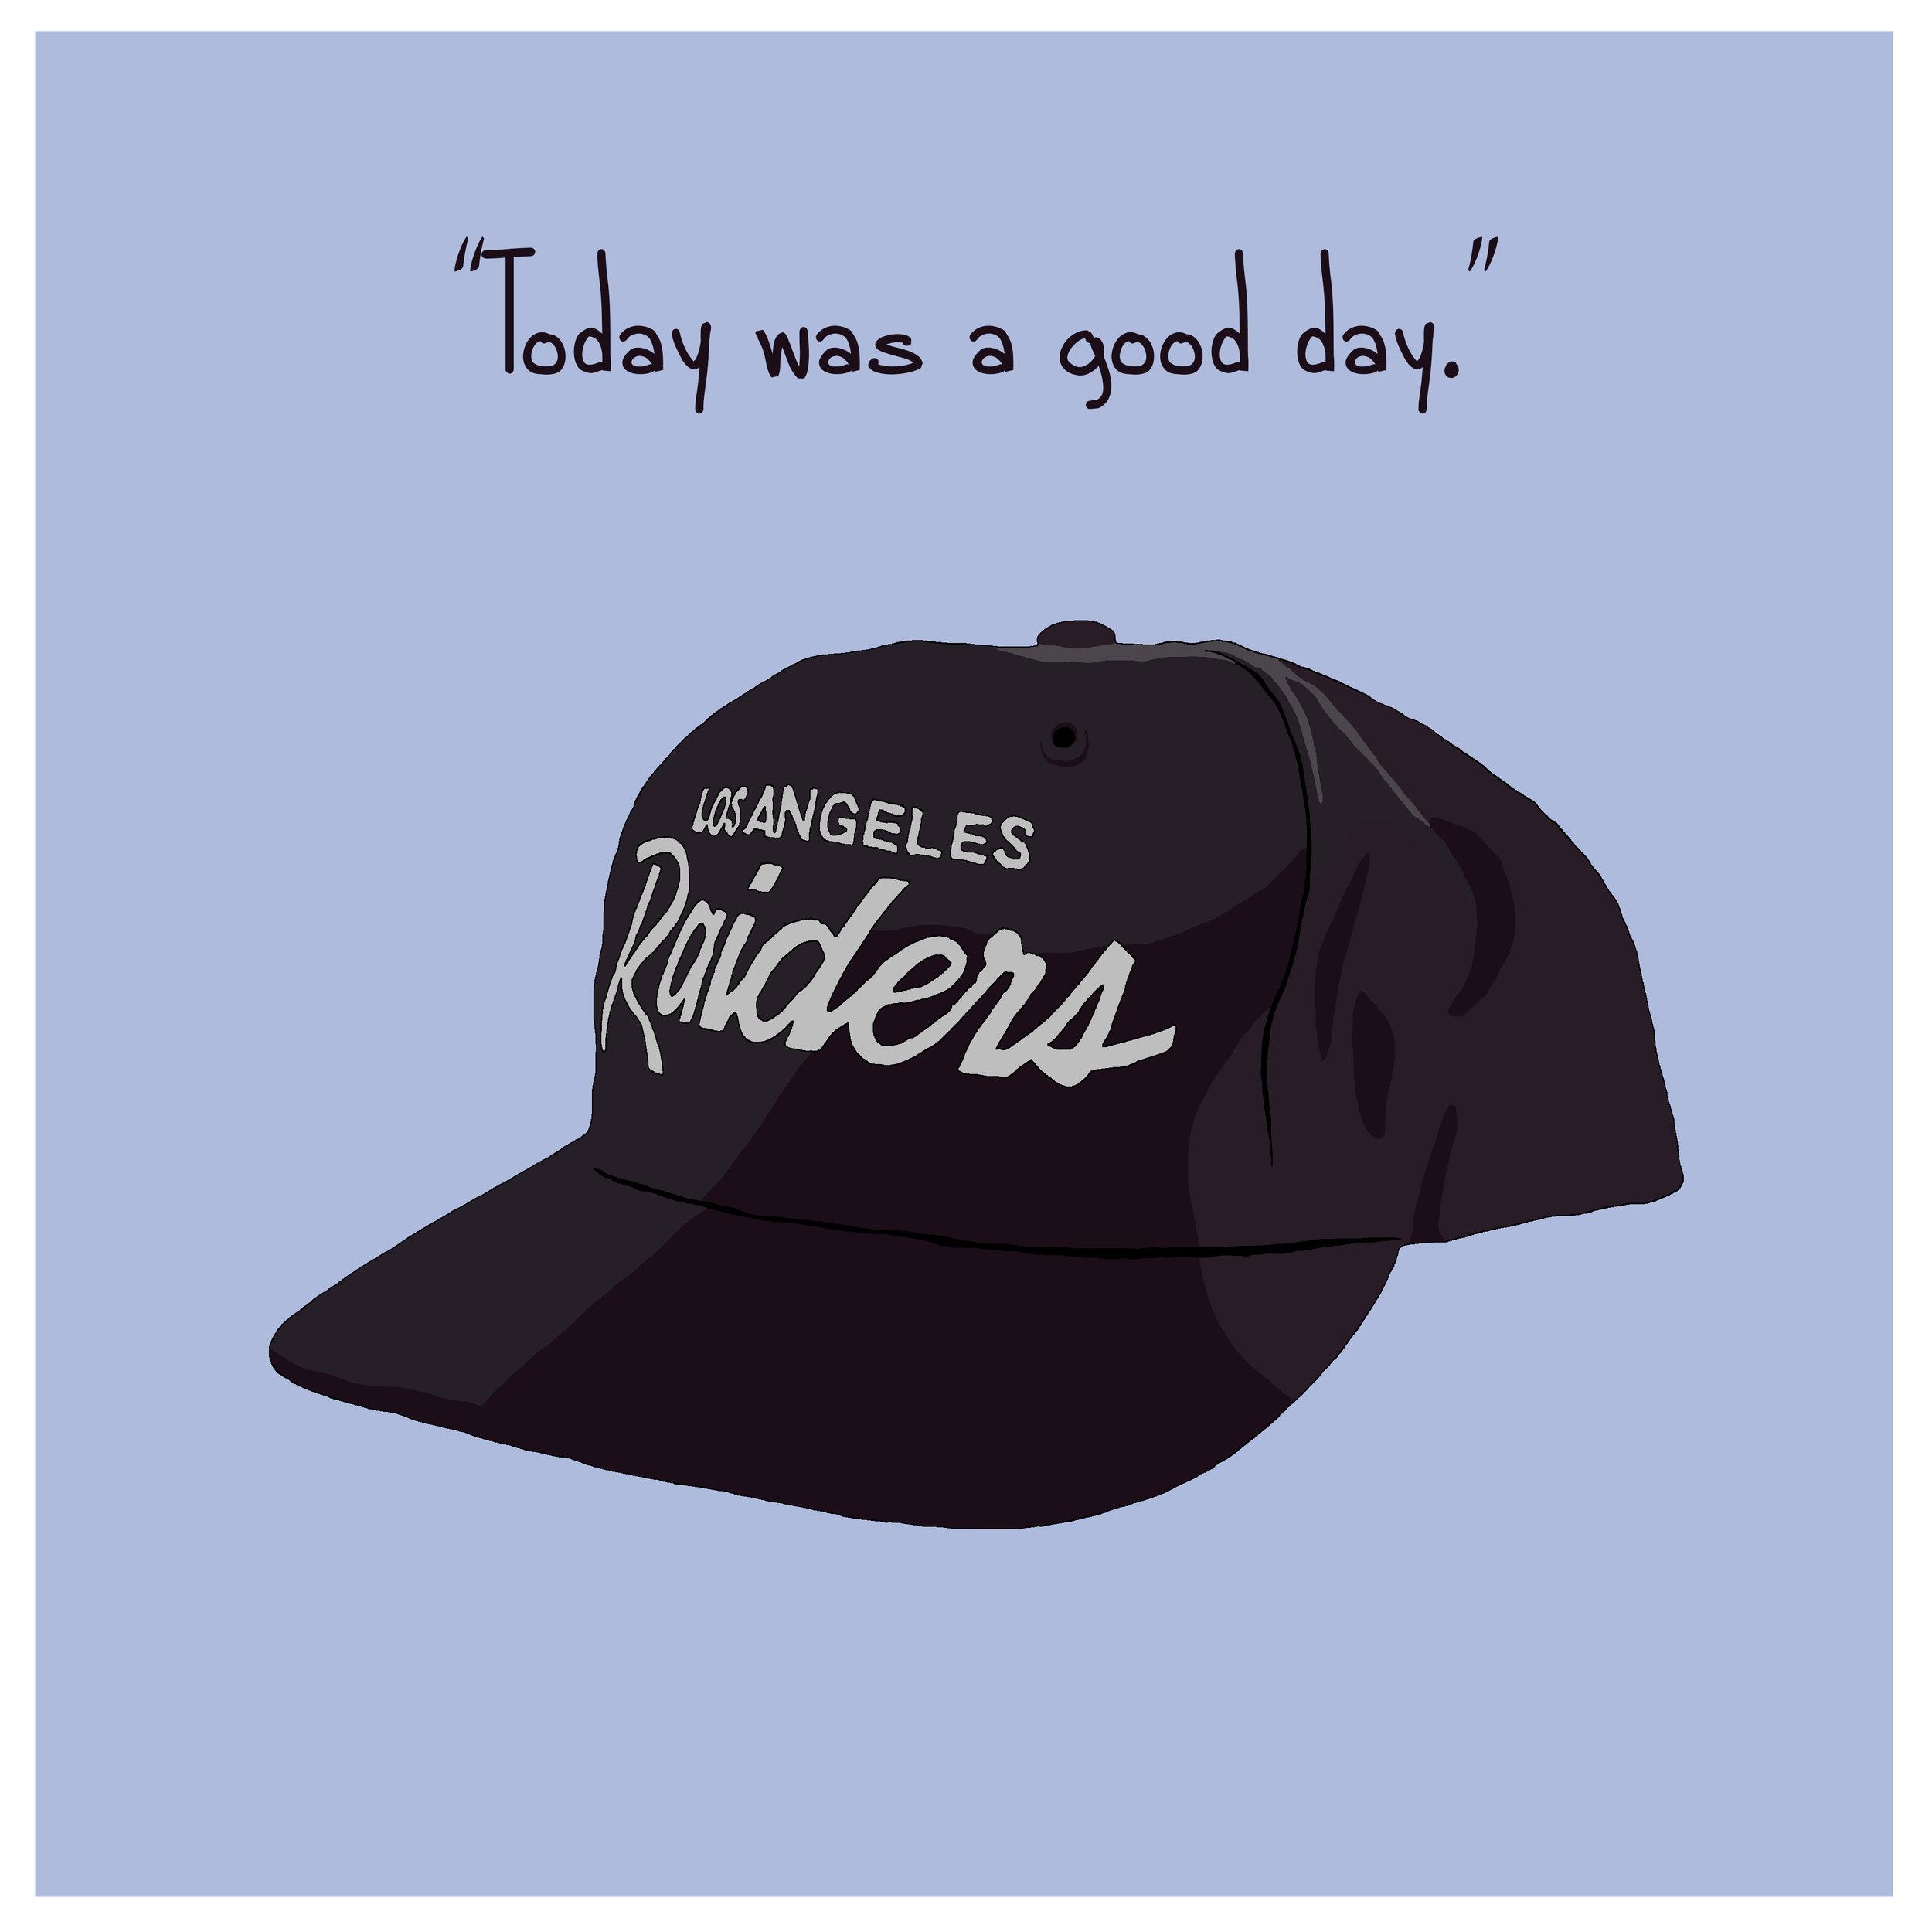 ICE CUBE'S RAIDERS HAT